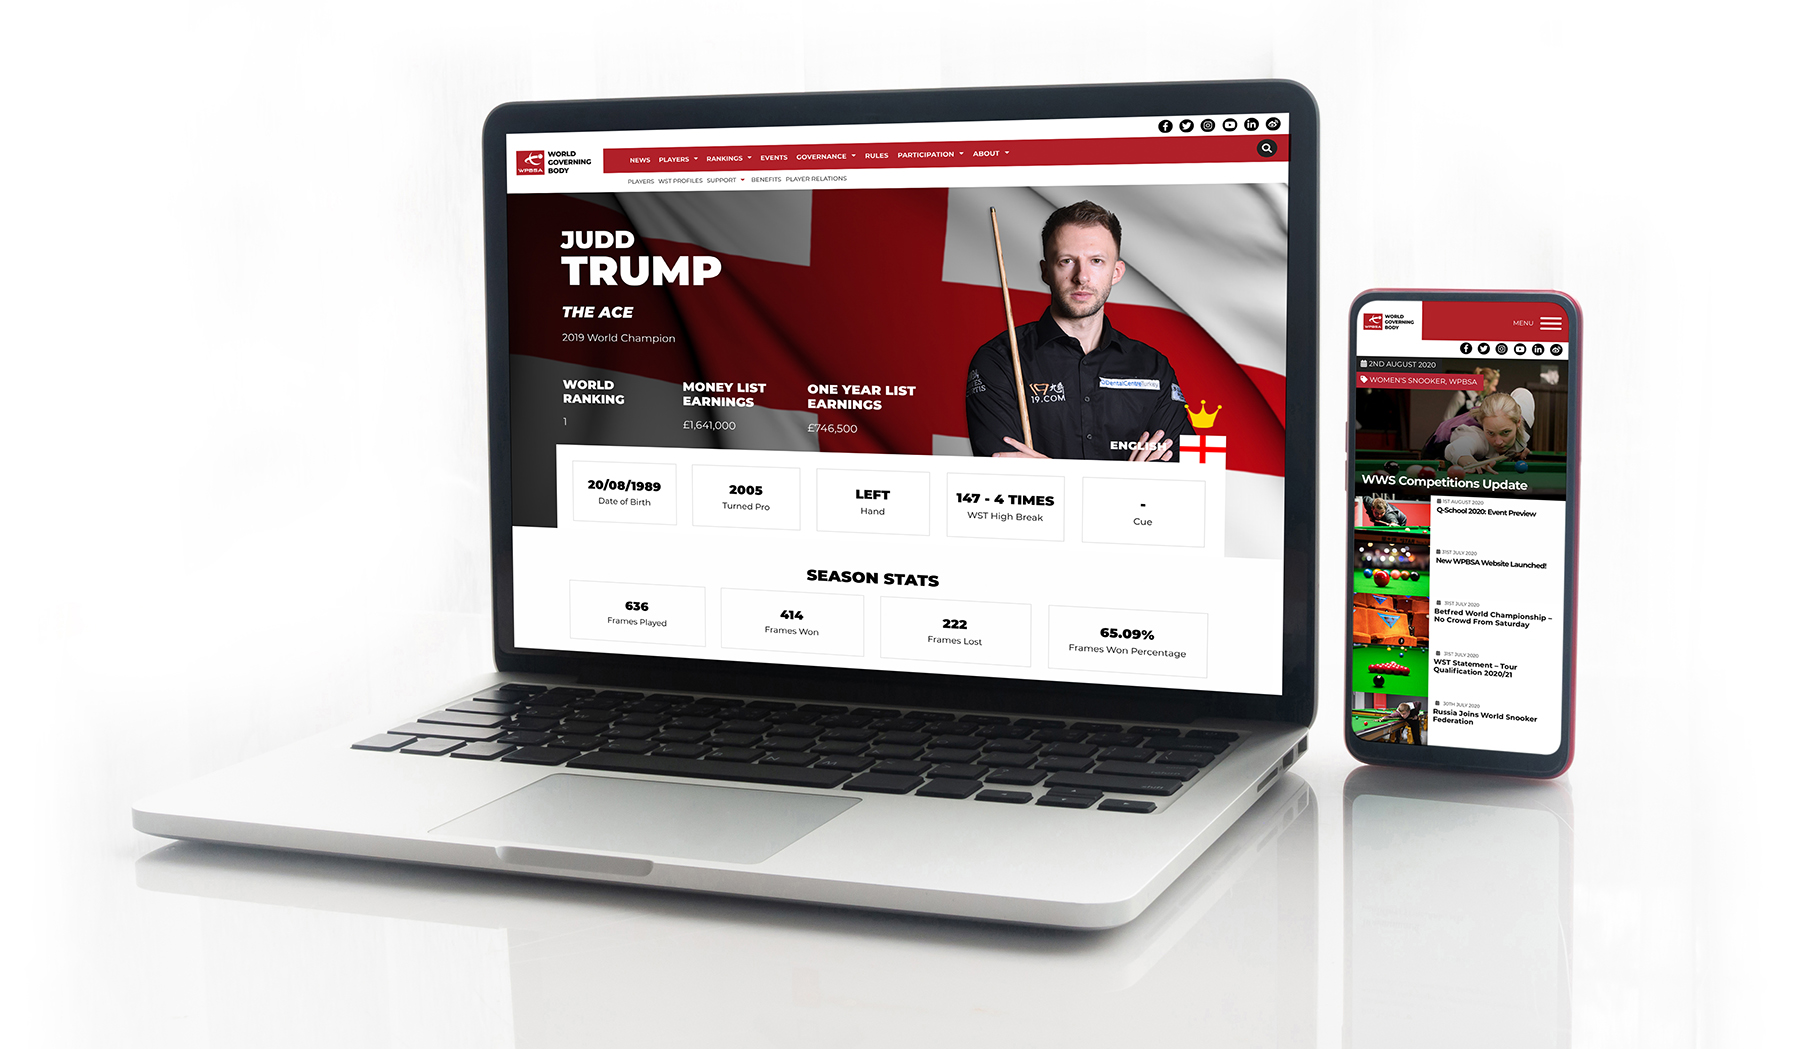 WPBSA website